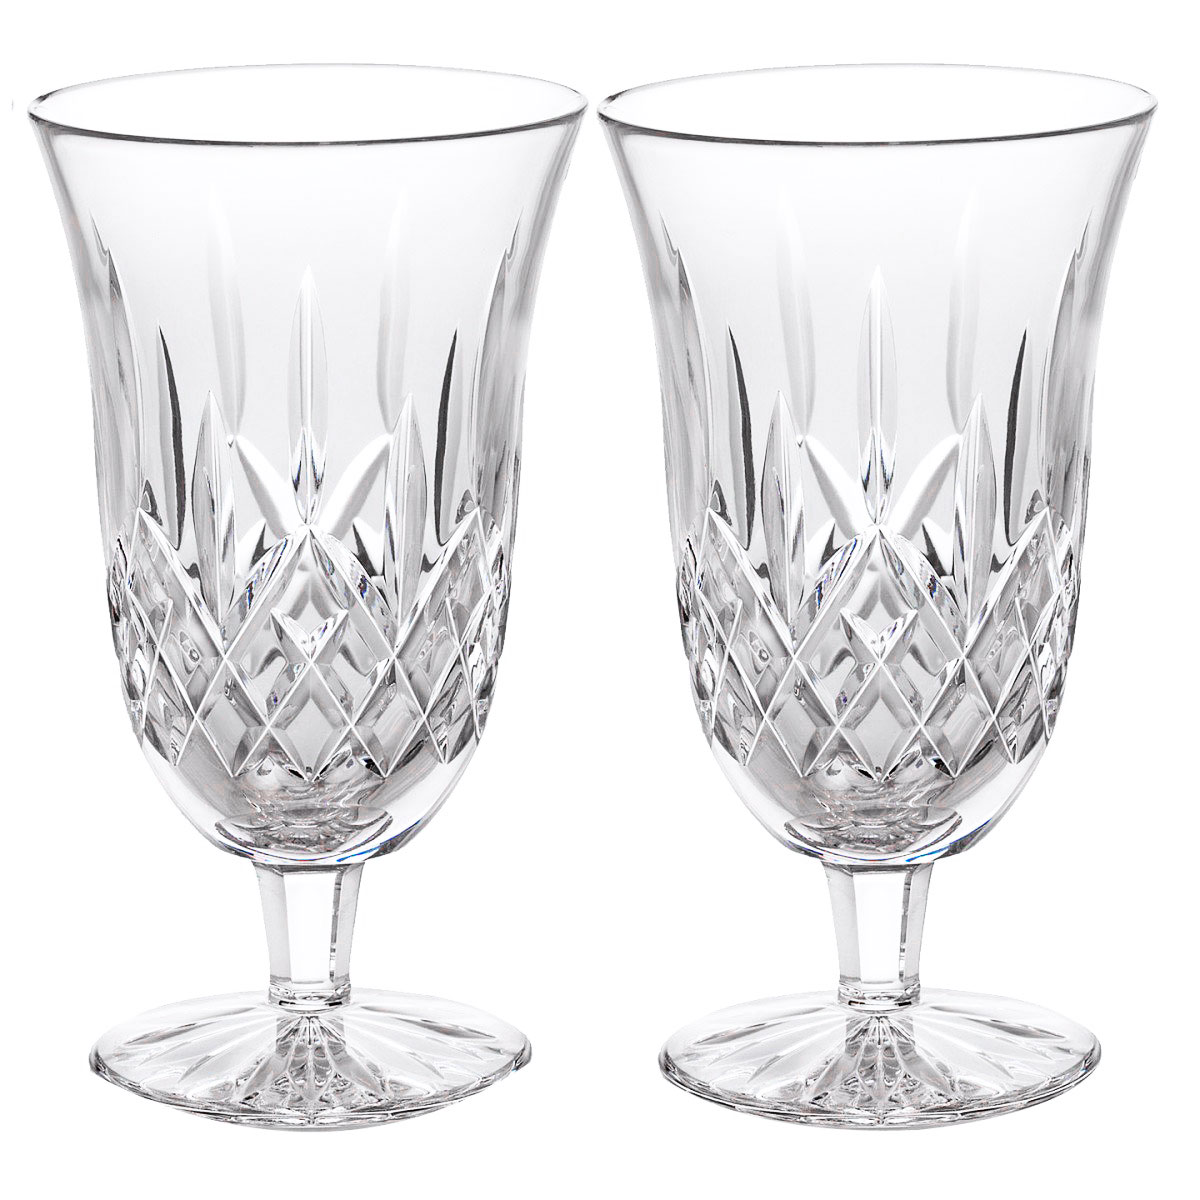 Waterford Crystal, Lismore Footed Crystal Iced Beverage Glass, Pair